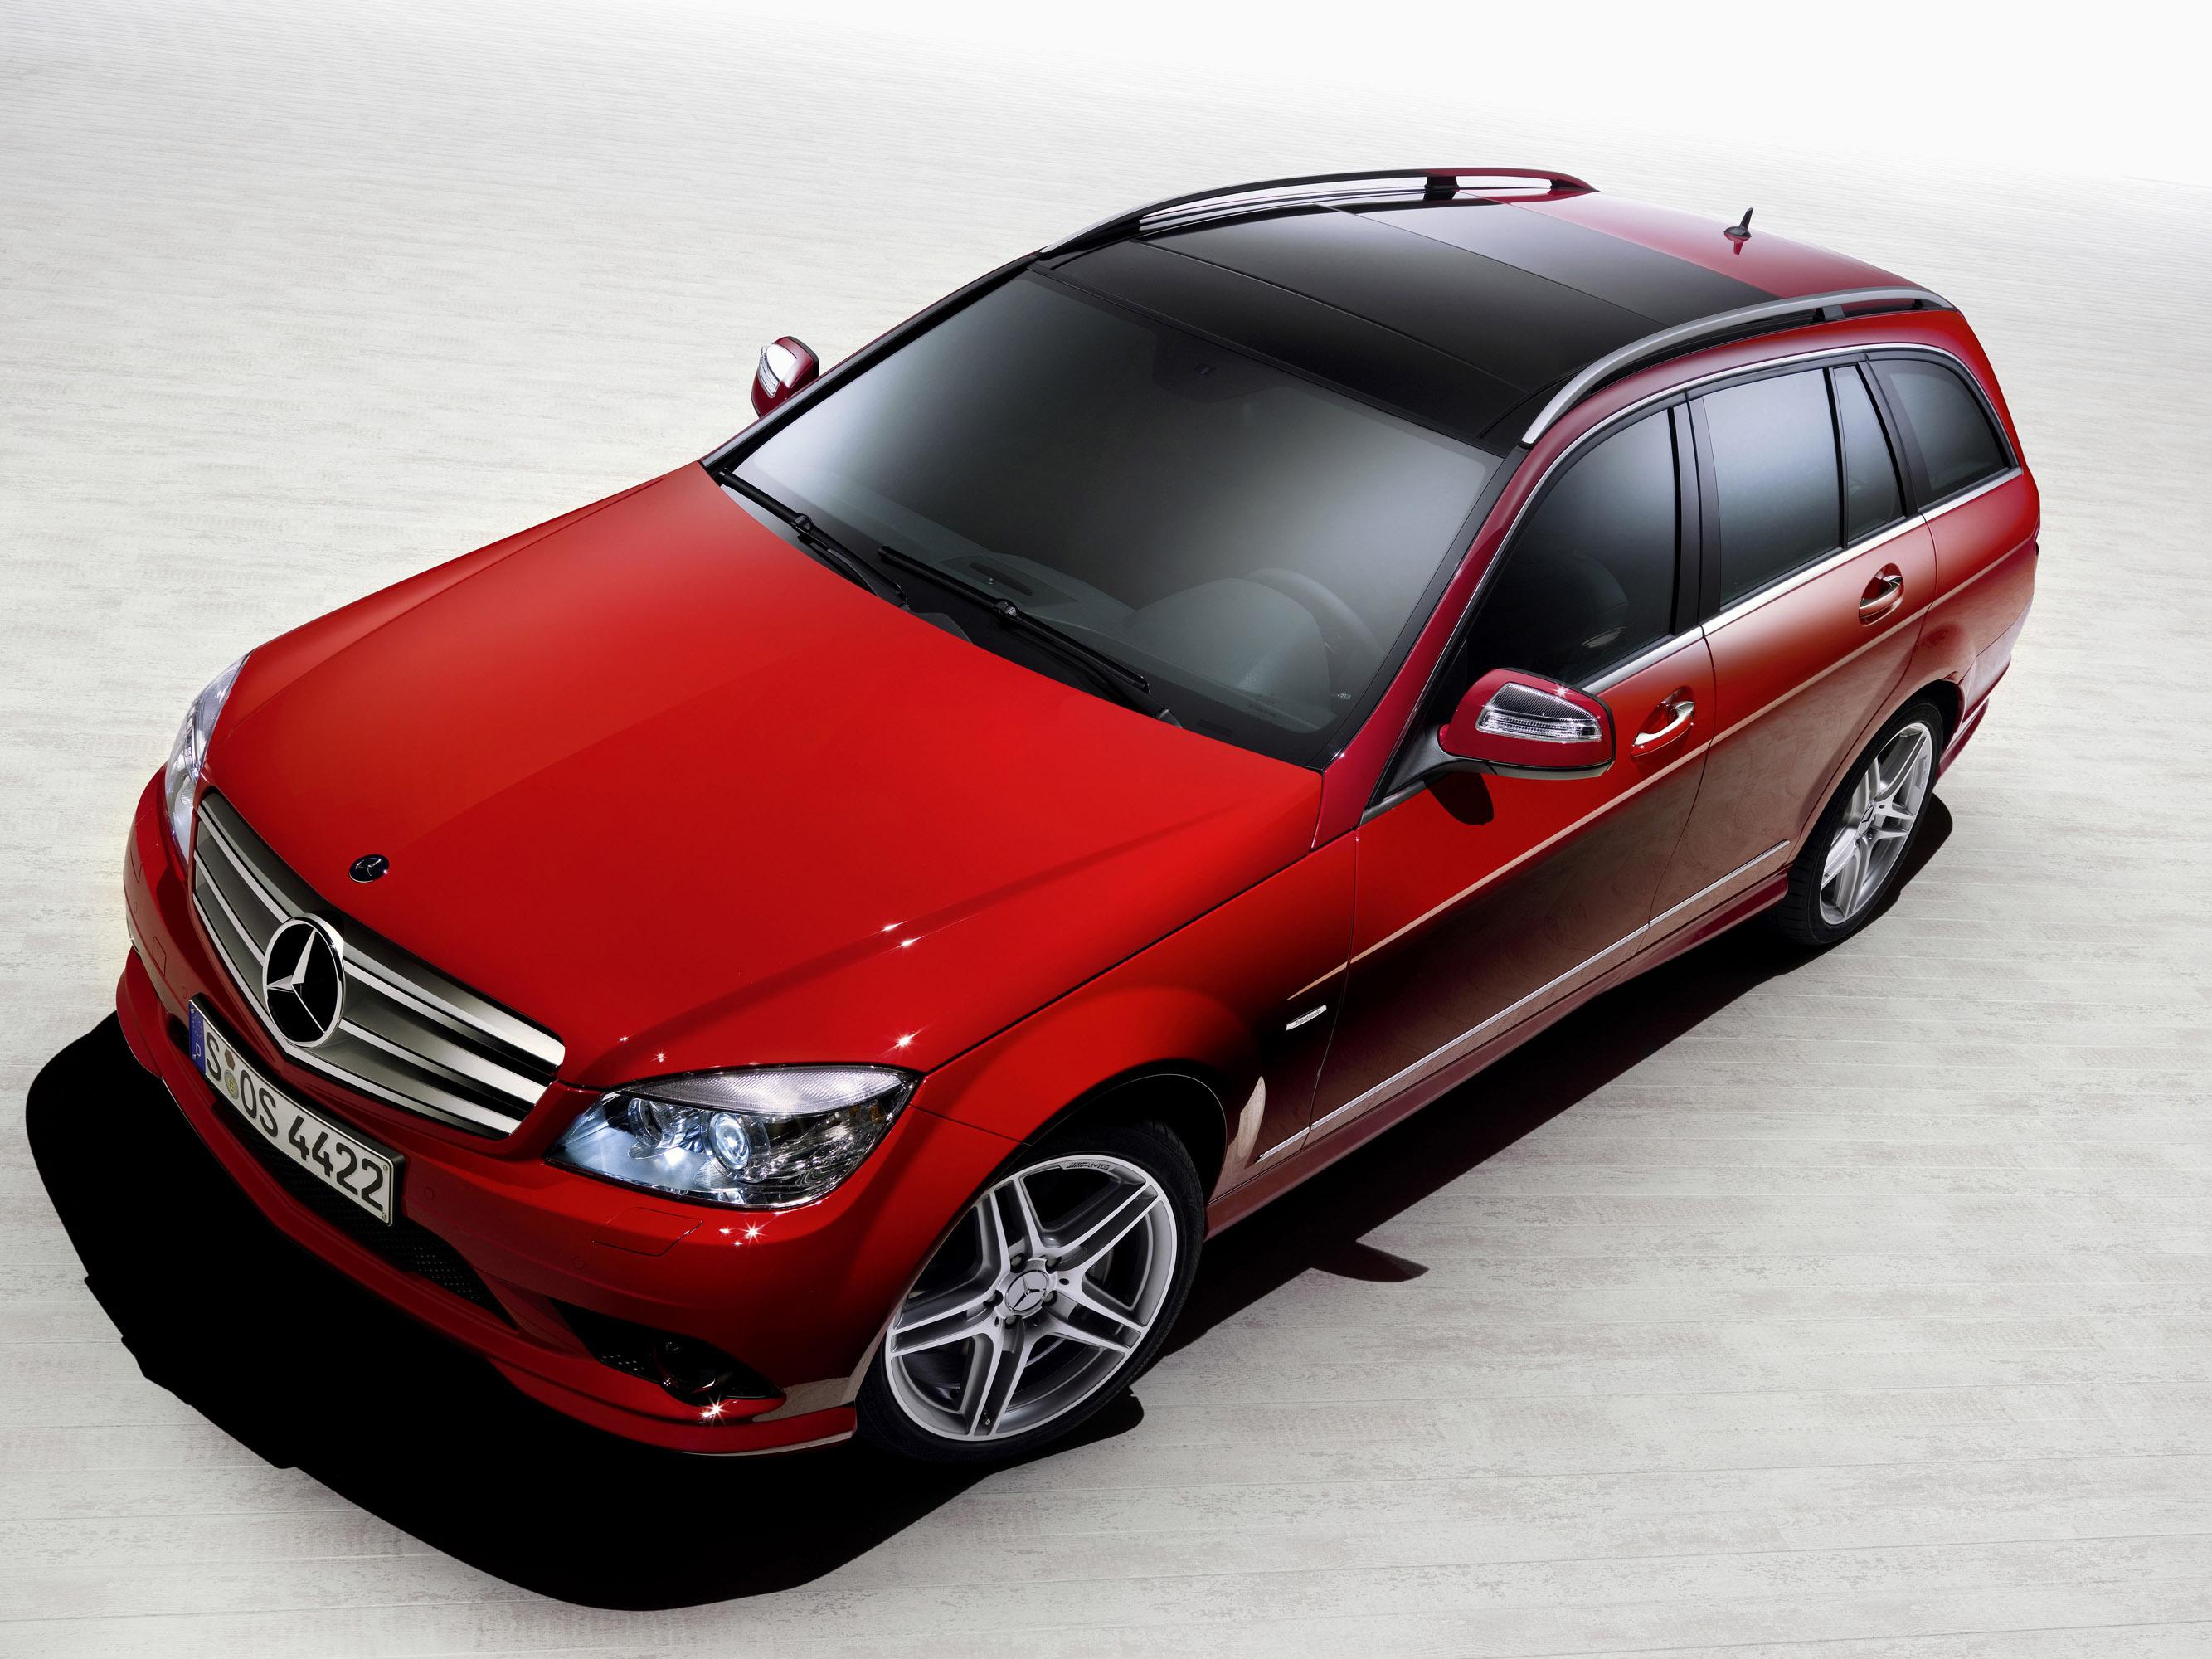 2008 Mercedes-Benz C-Class Estate - HD Pictures ...